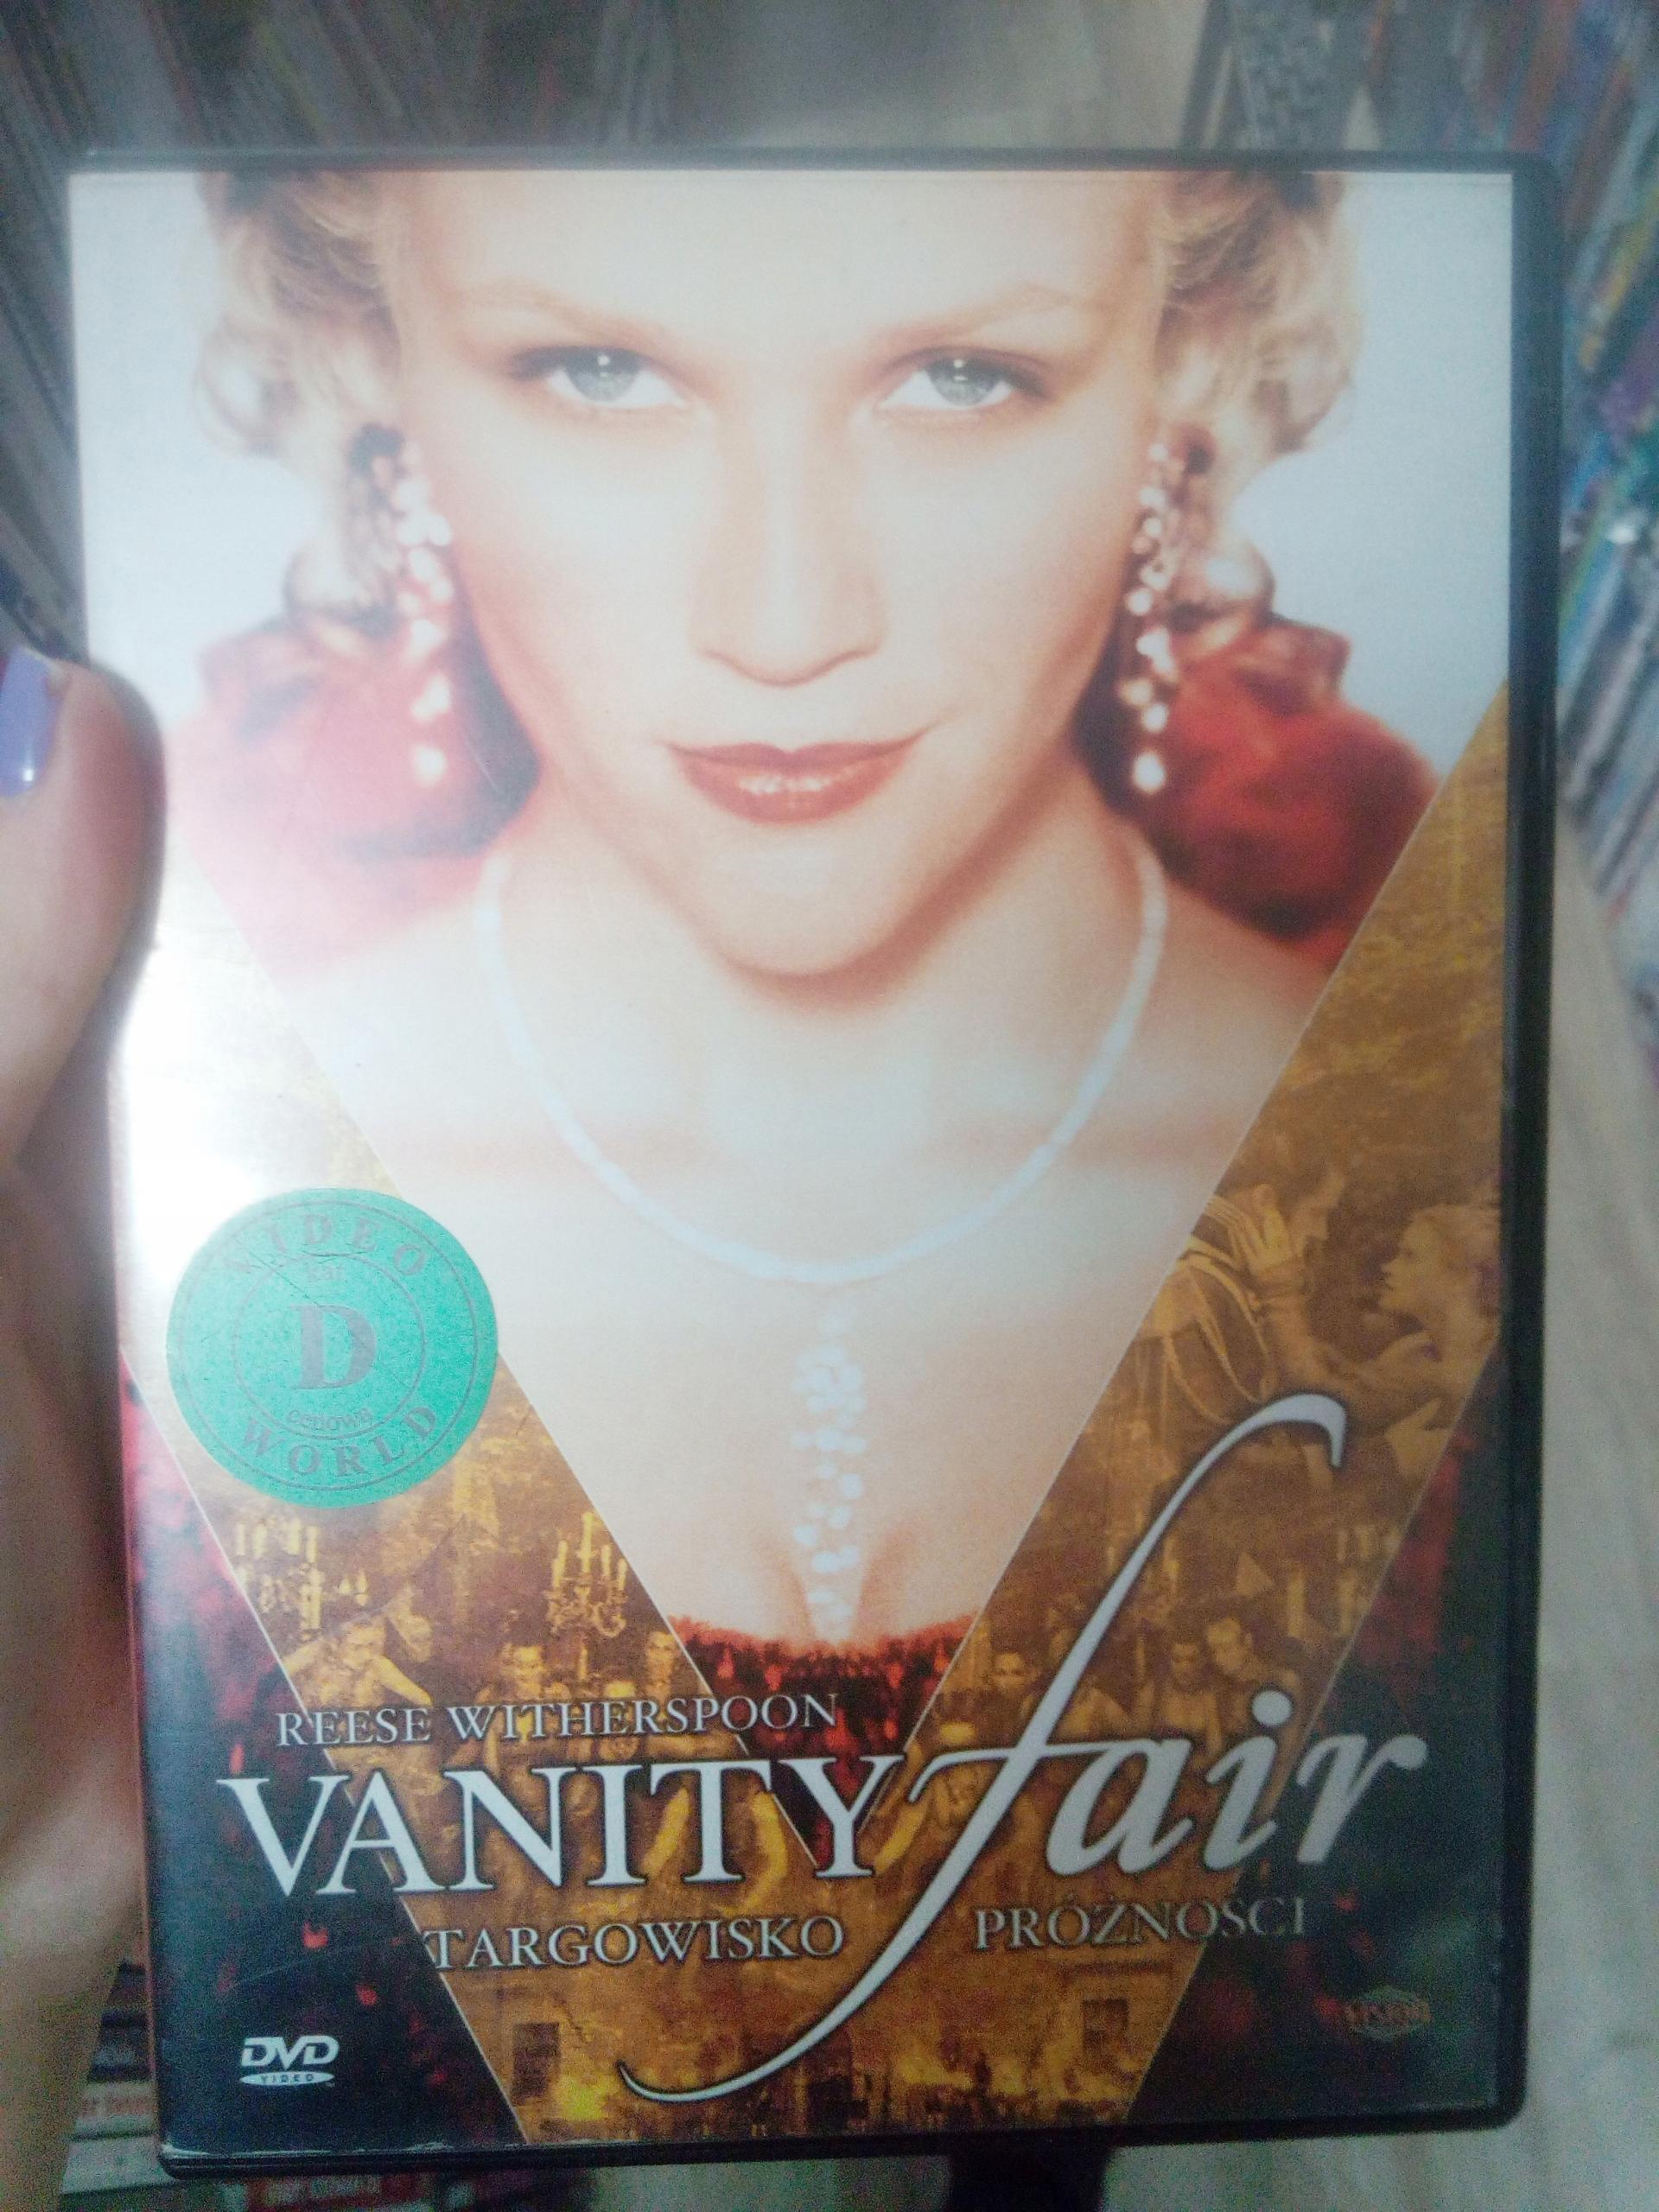 VANITY FAIR TARGOWISKO PRÓŻNOŚCI DVD SKLEP TYCHY